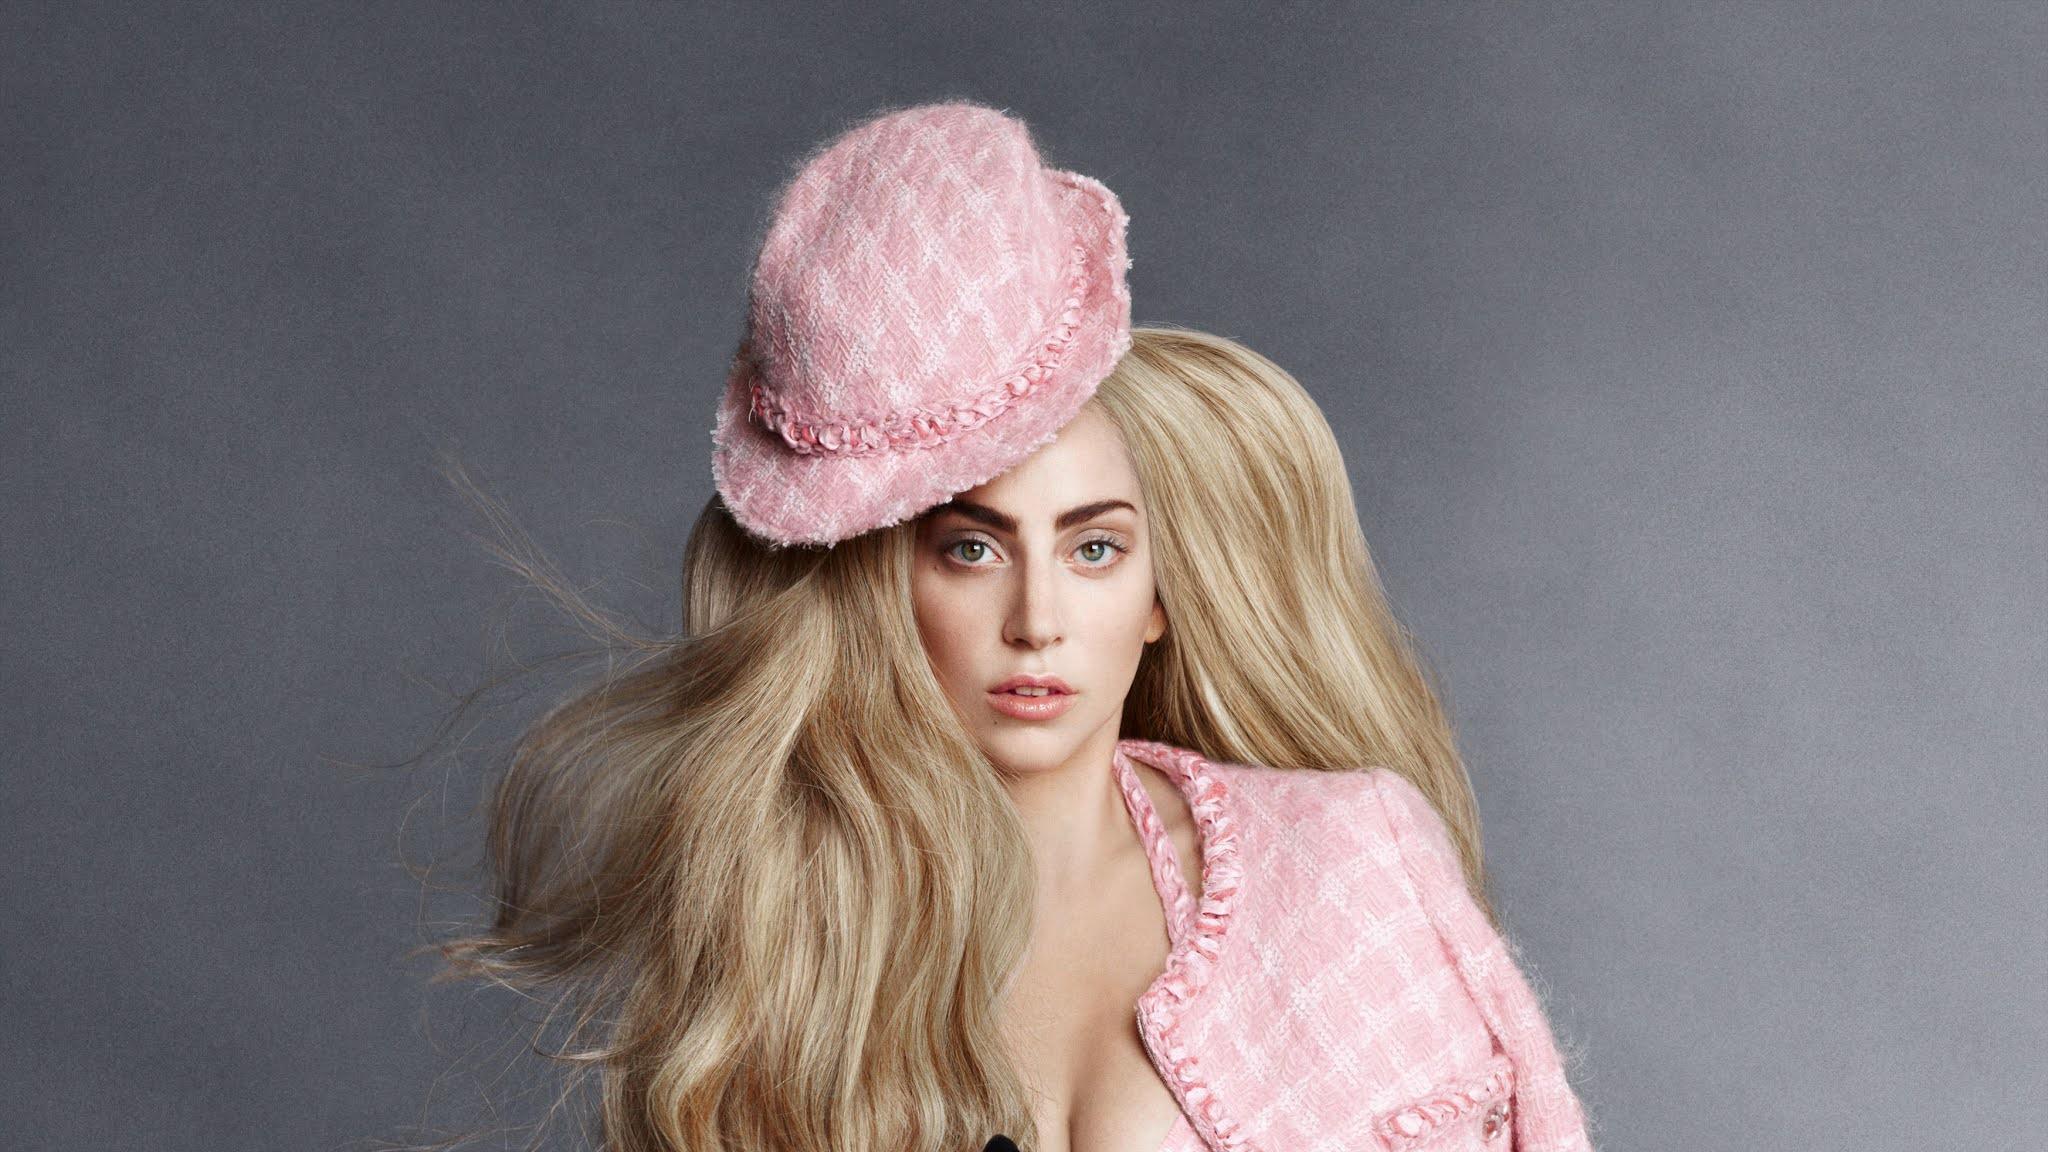 95 inspiring Lady Gaga Quotes